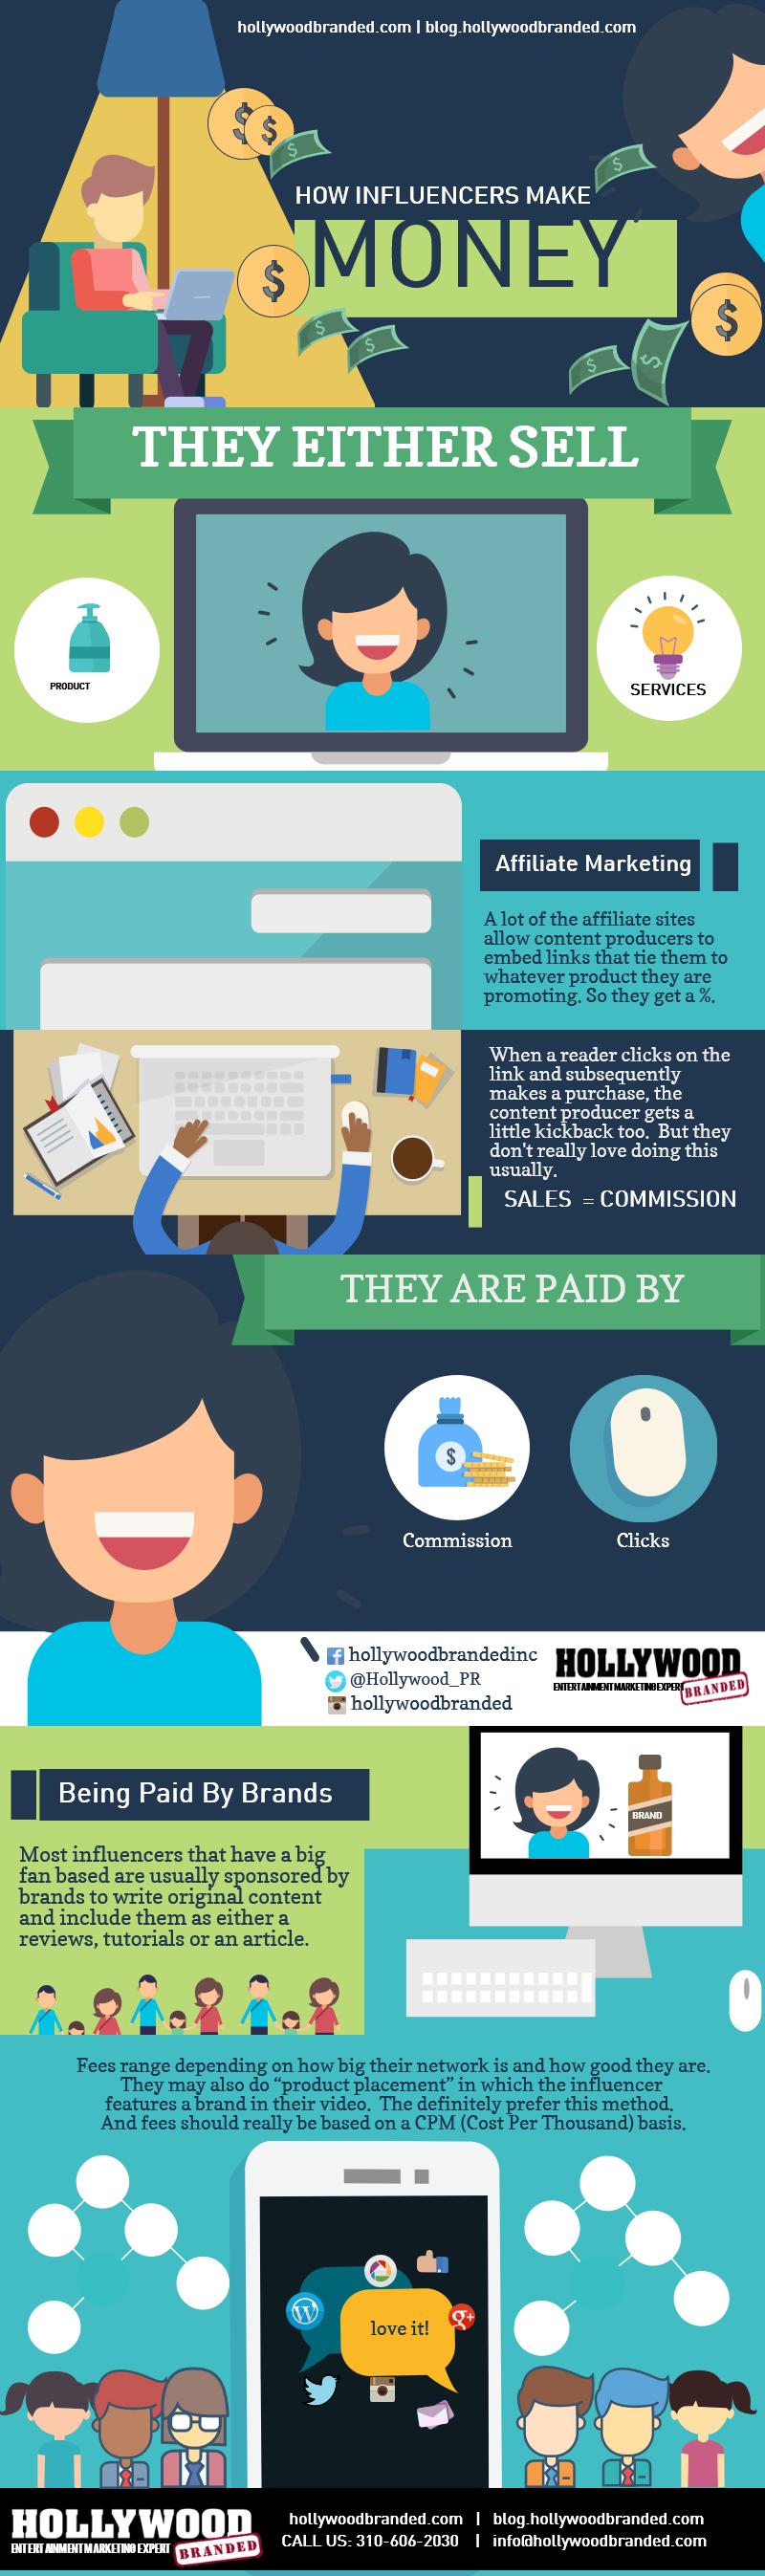 Piktochart Social Influencers Make Money.png